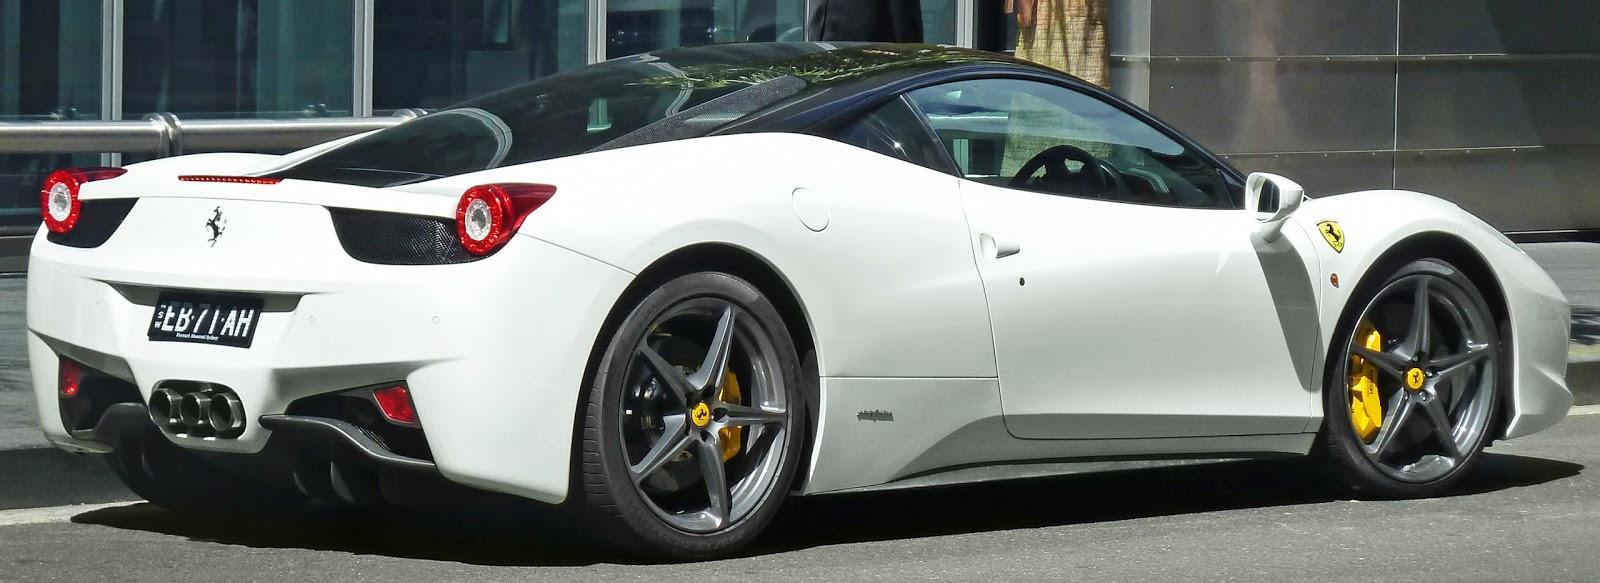 Model of the Day: OEM Ferrari 458 Italia GT2 in black and ...